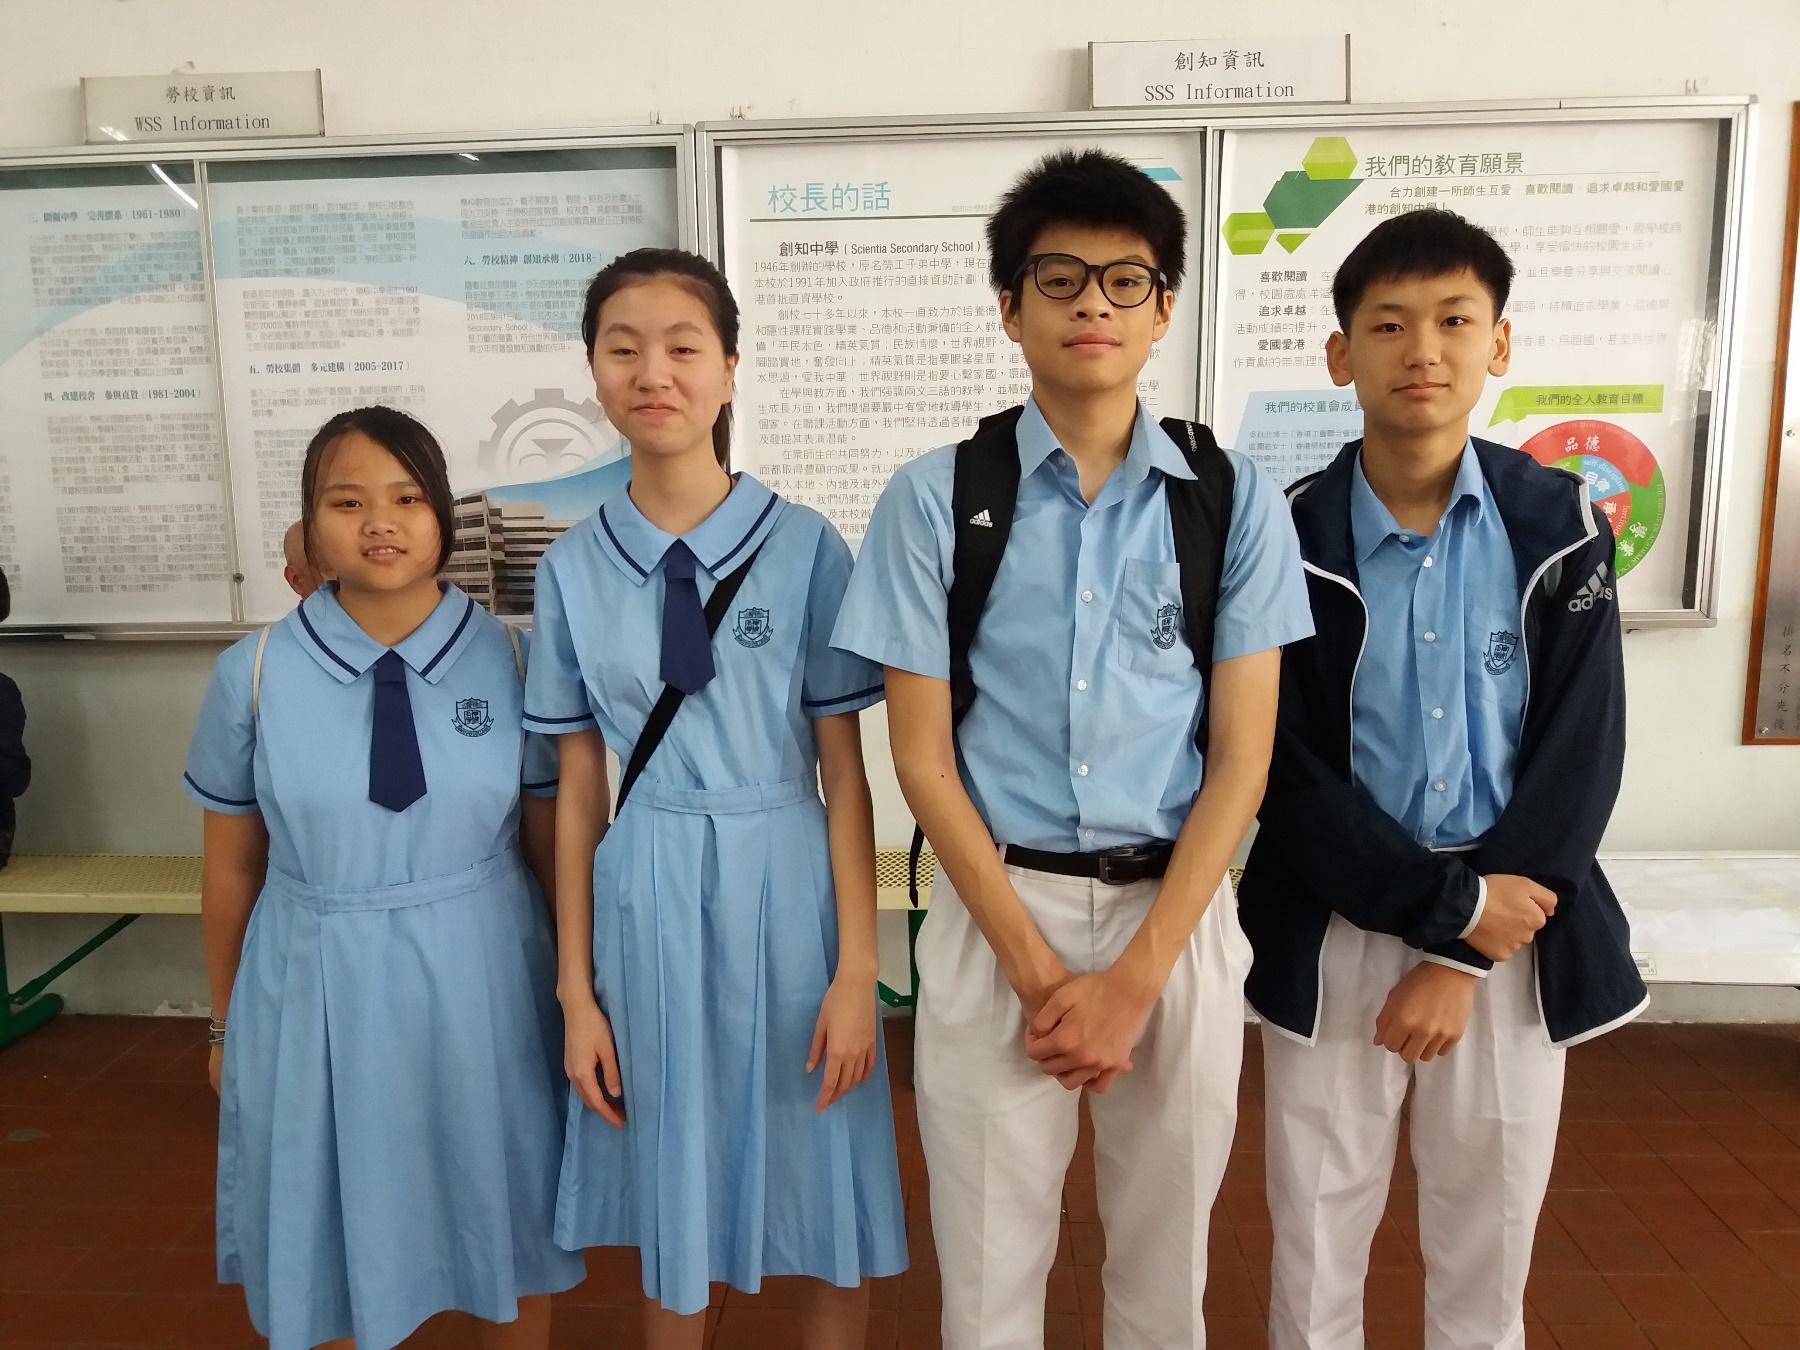 http://npc.edu.hk/sites/default/files/20190428_134148.jpg